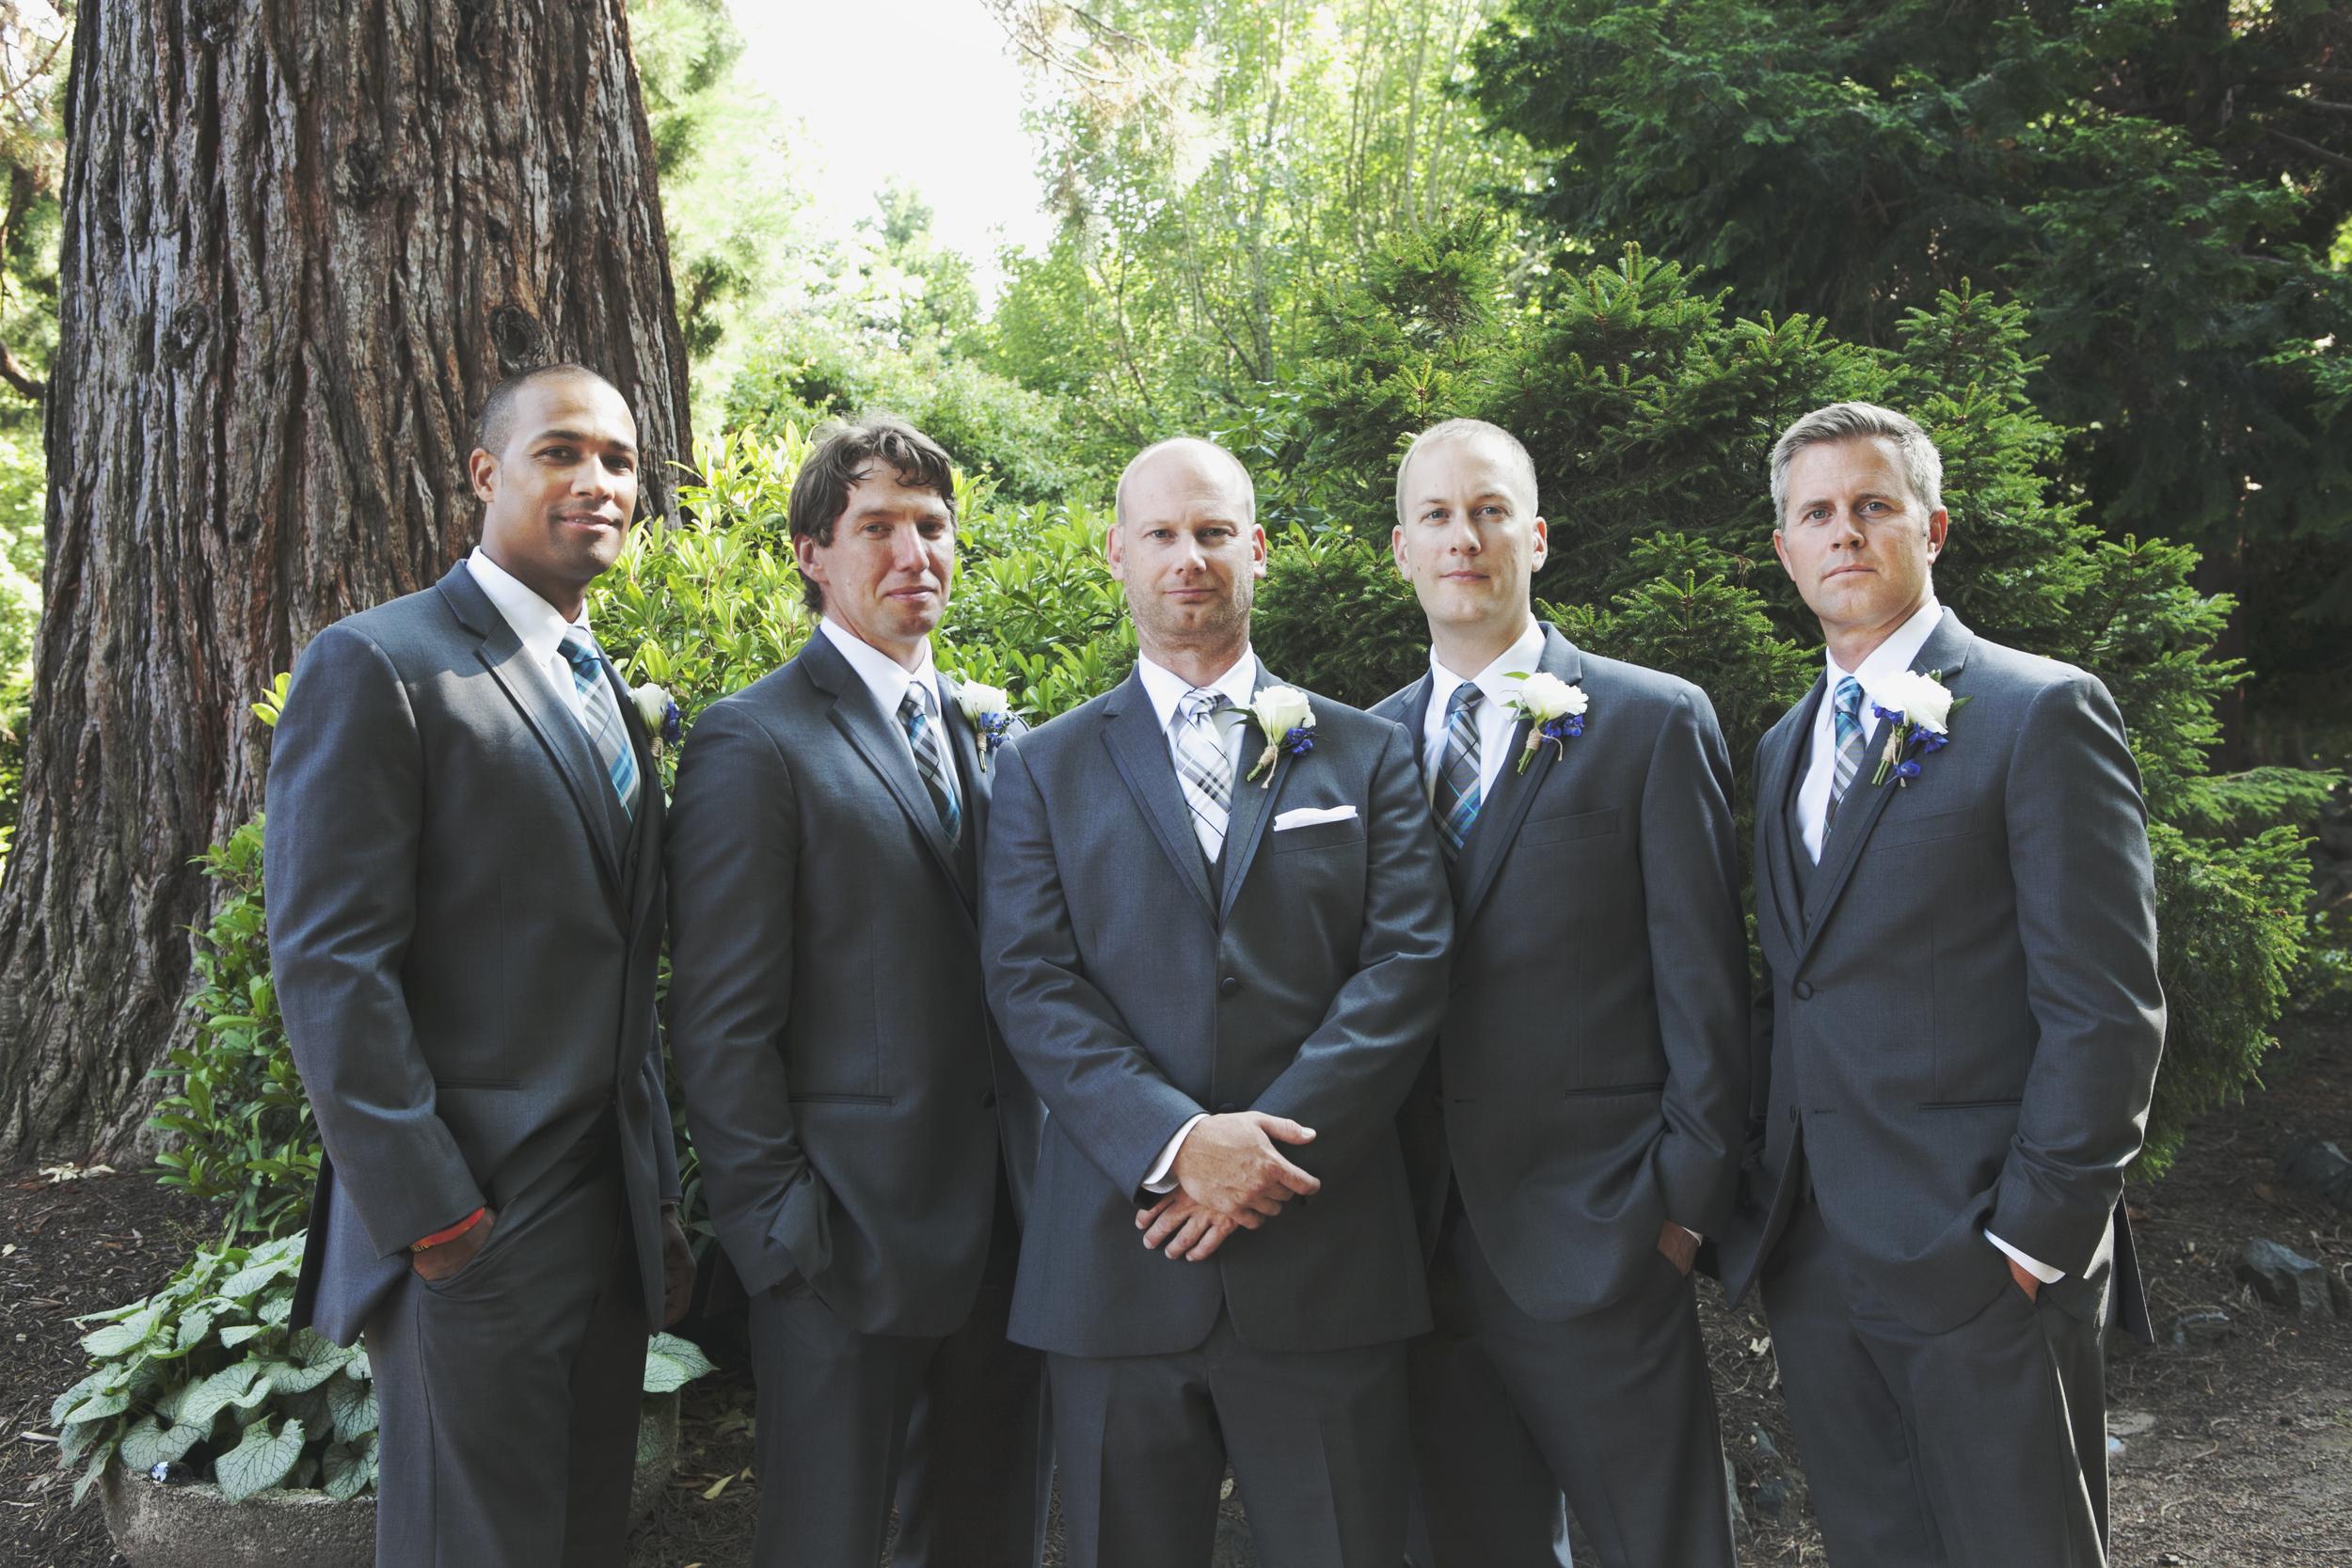 wedding13IMG_8859.jpg